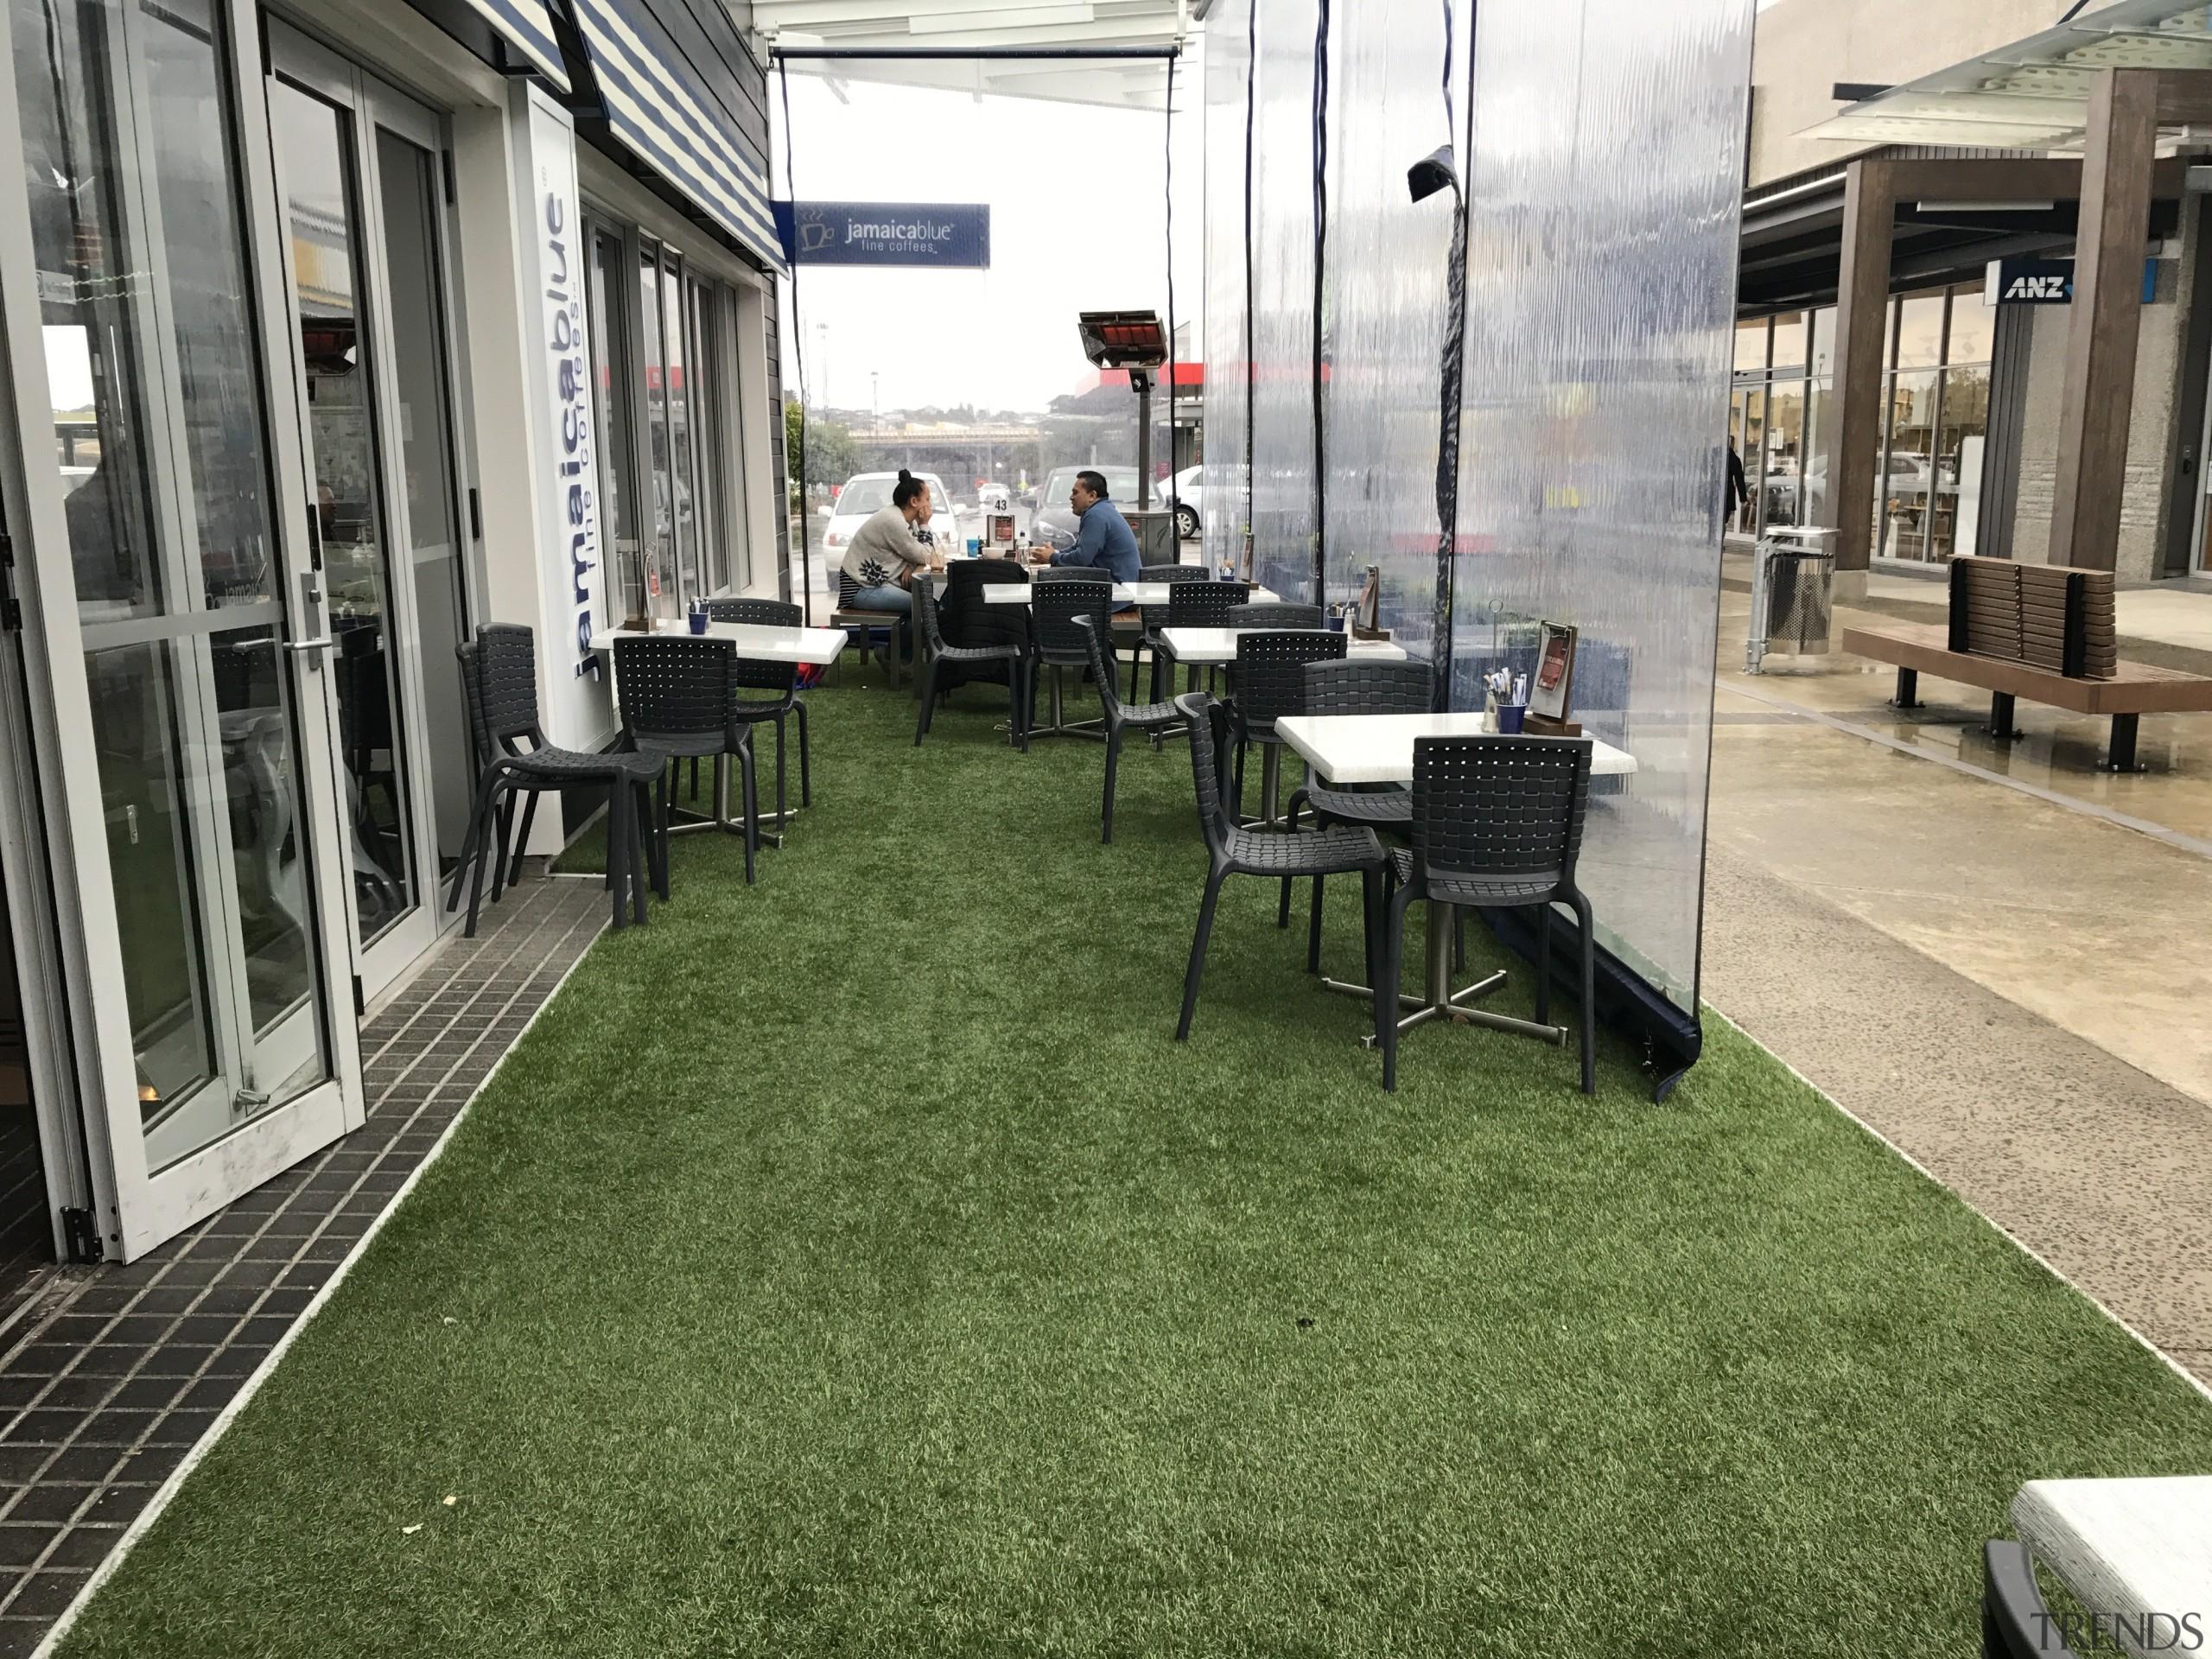 Commercial landscape - floor | flooring | grass floor, flooring, grass, lawn, plant, brown, gray